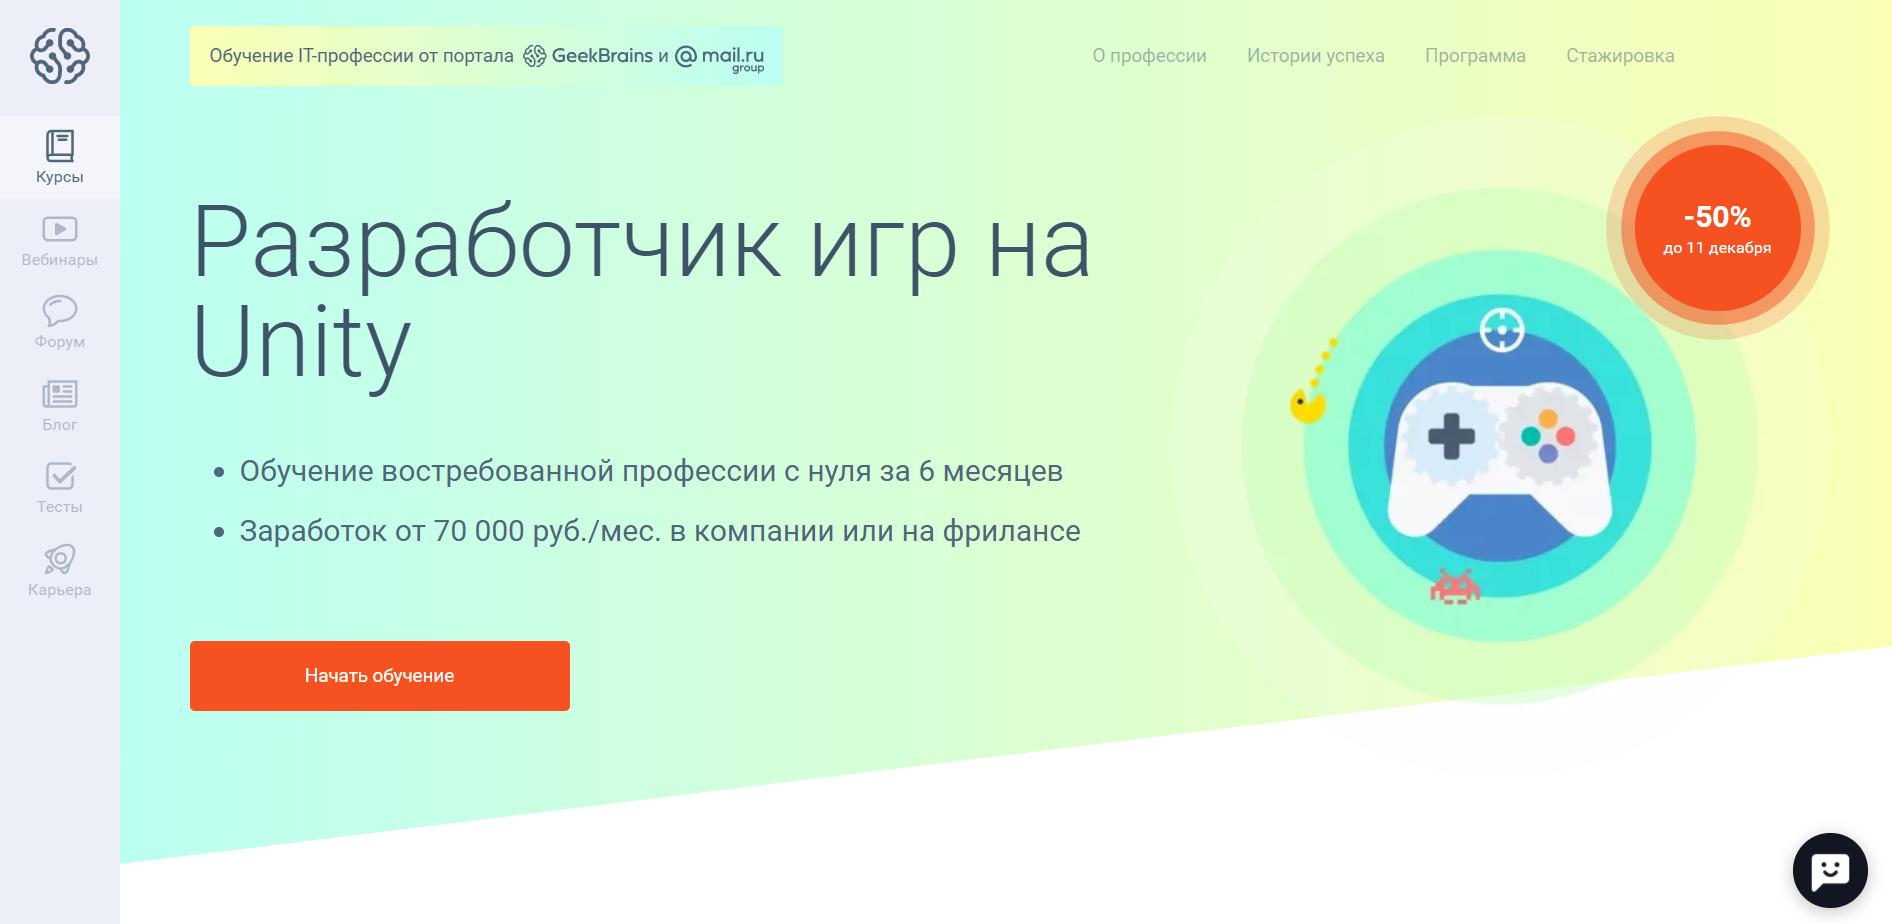 Unity-разработчик стать с нуля geekbrains